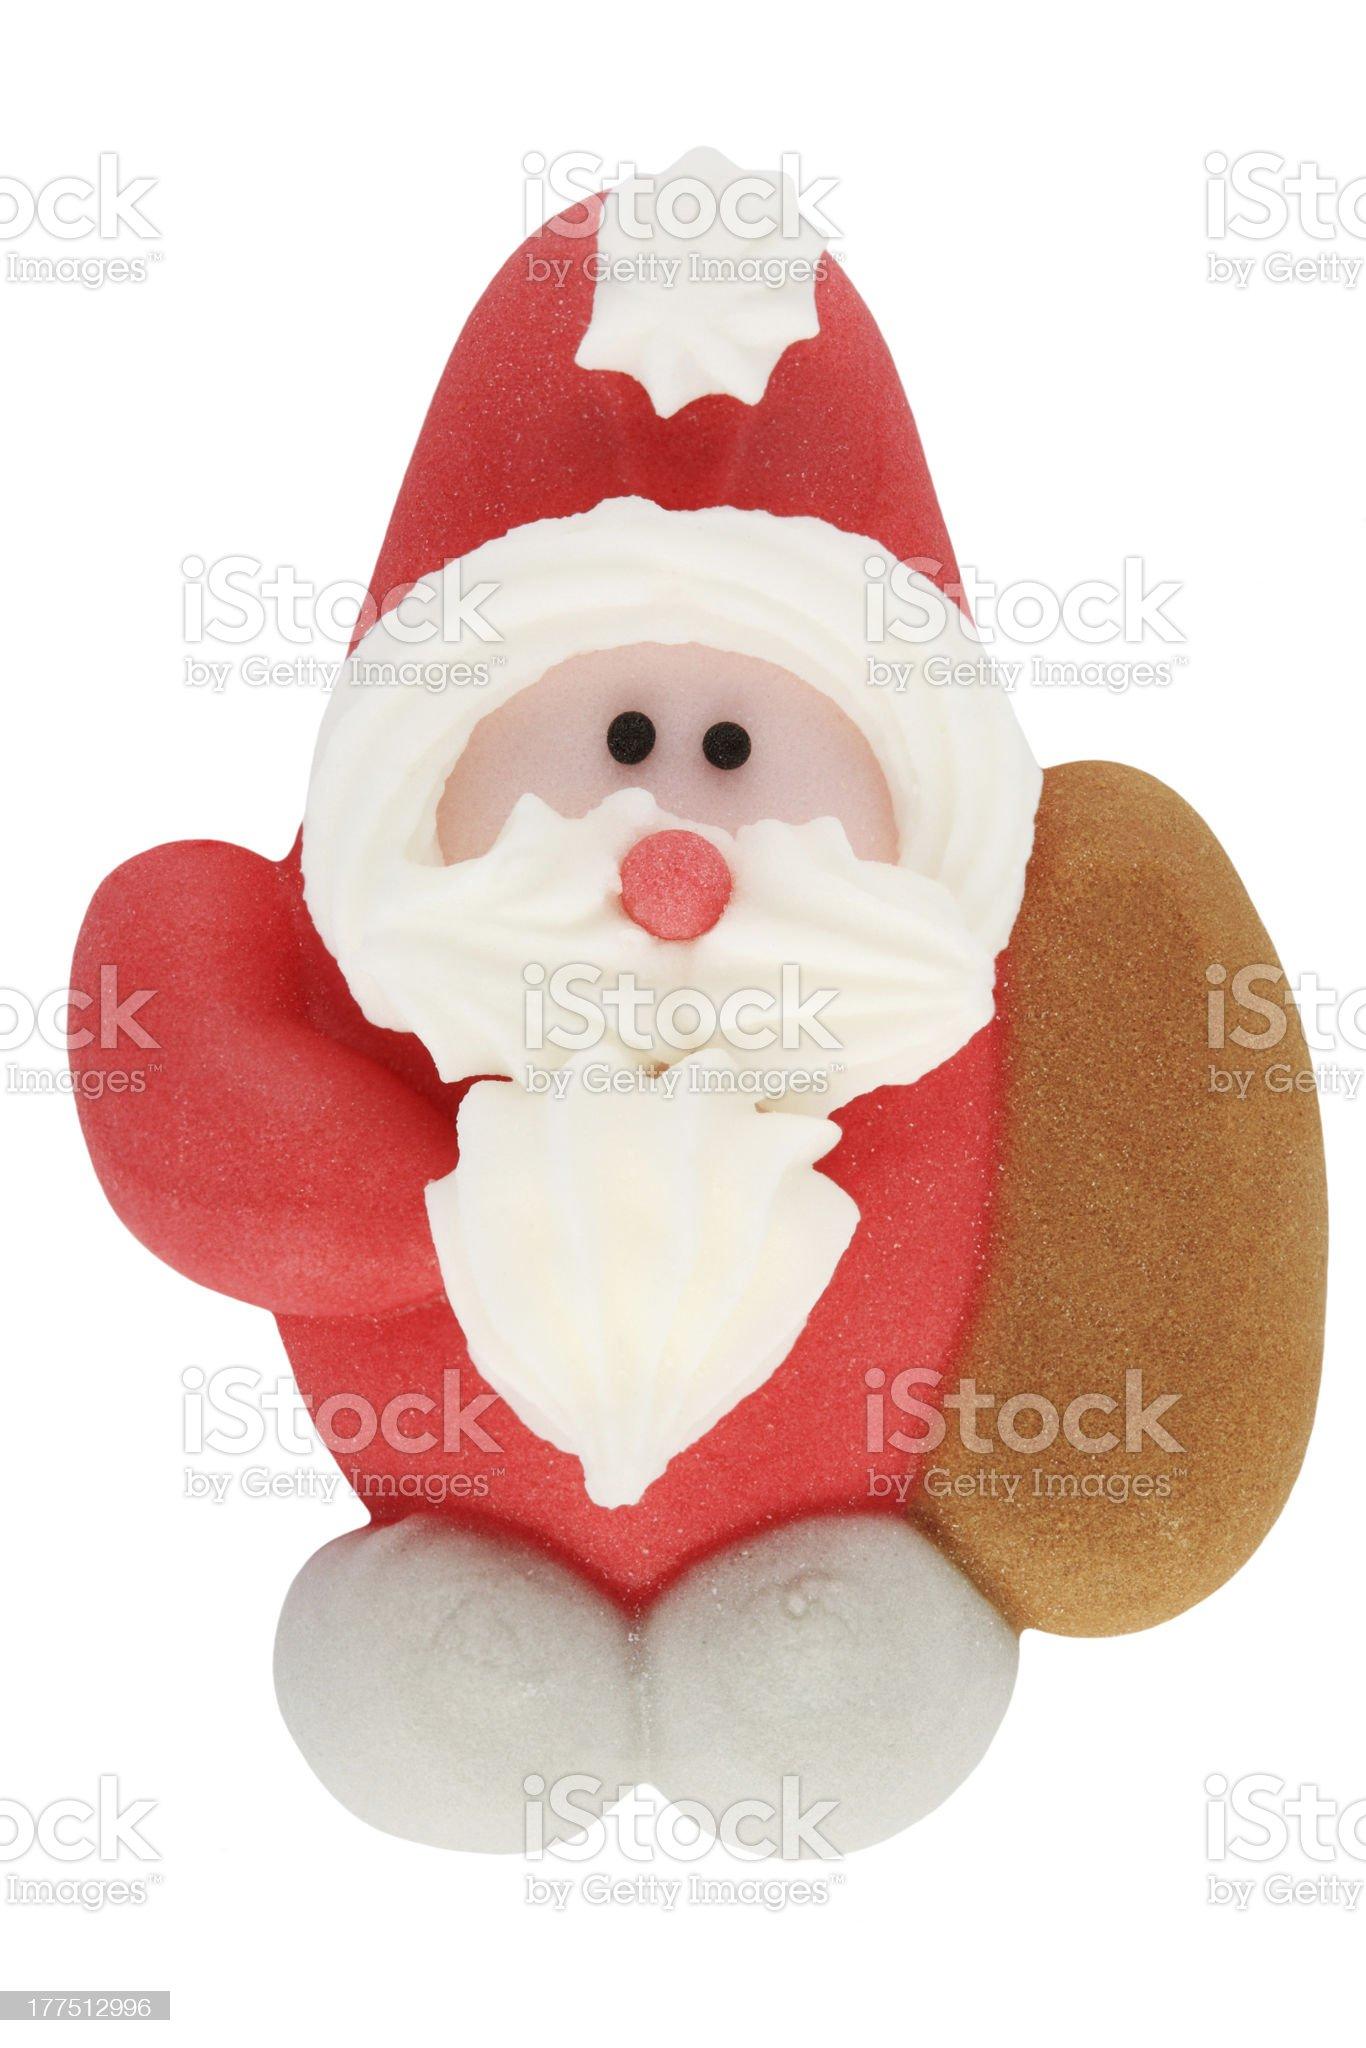 Gingerbread Santa Claus royalty-free stock photo